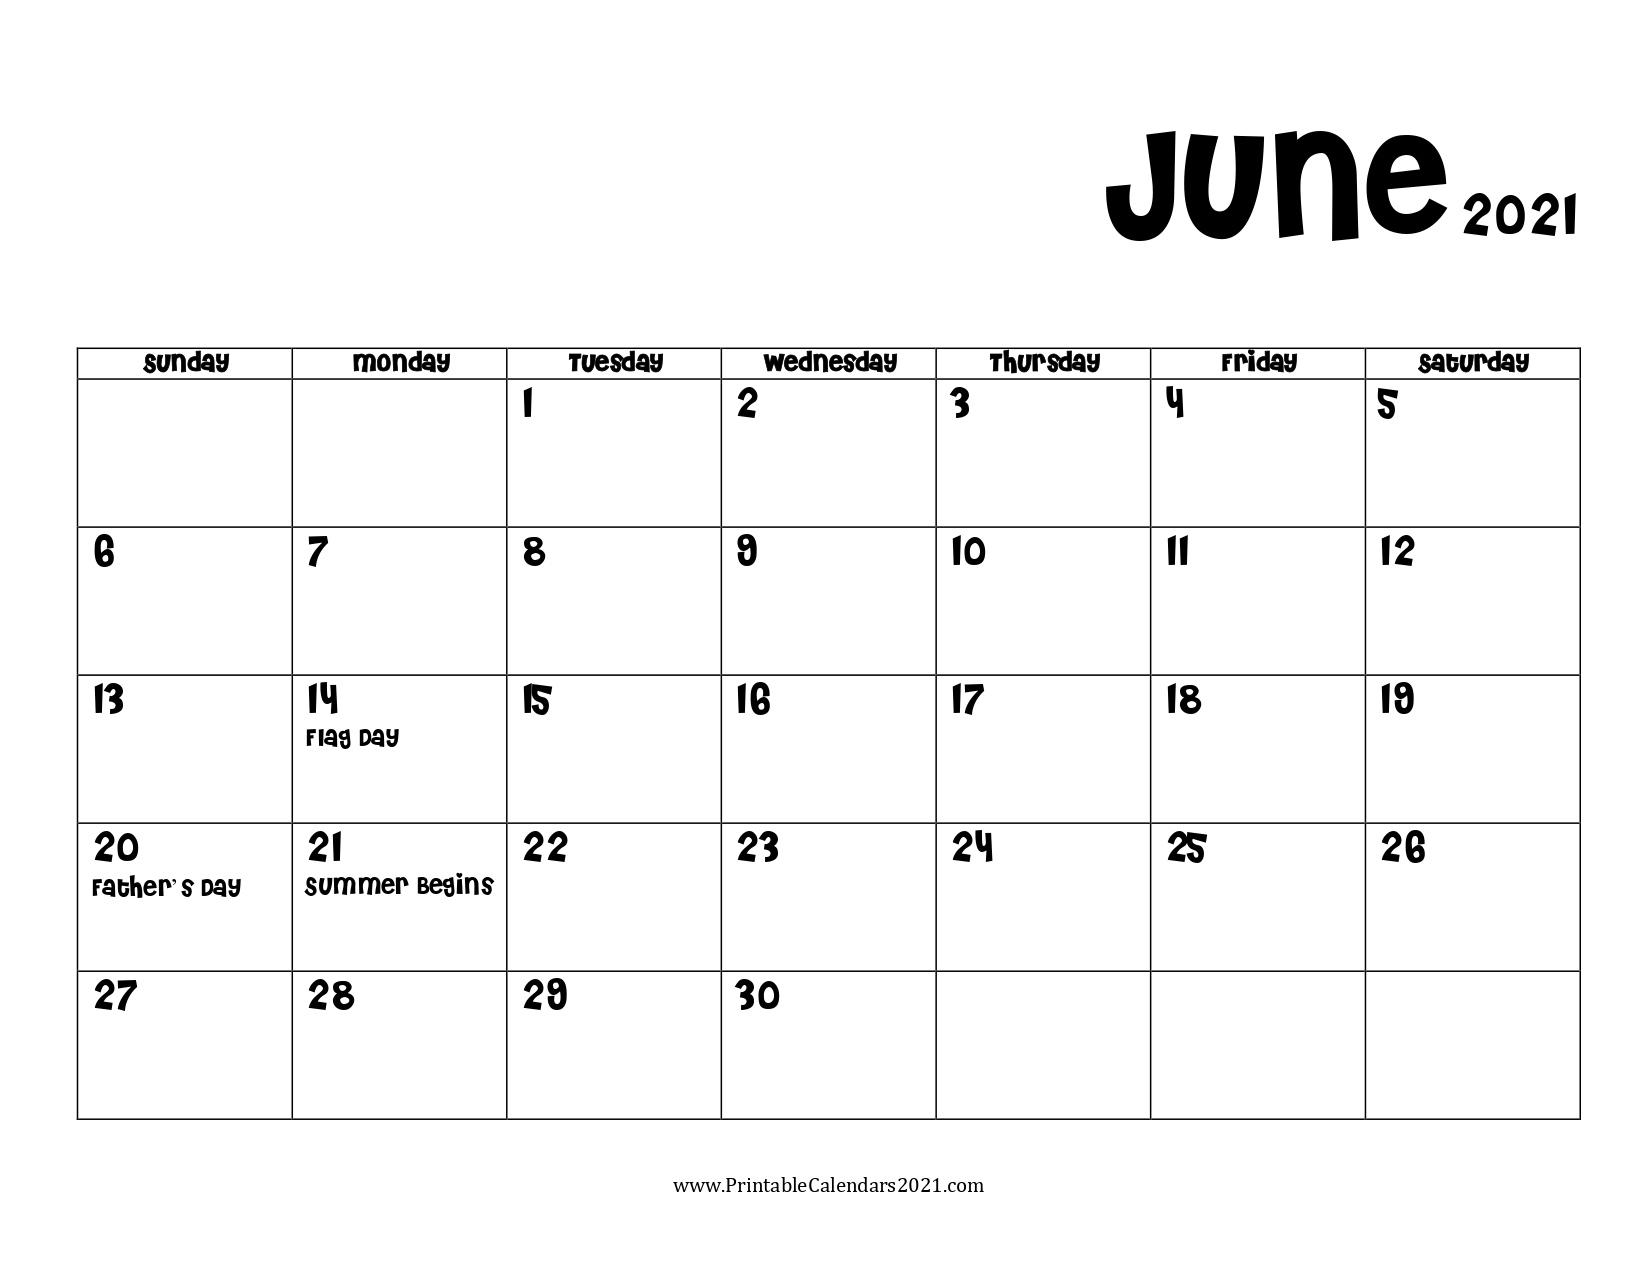 60+ Free June 2021 Calendar Printable With Holidays, Blank, Pdf June 2021 Calendar Printable